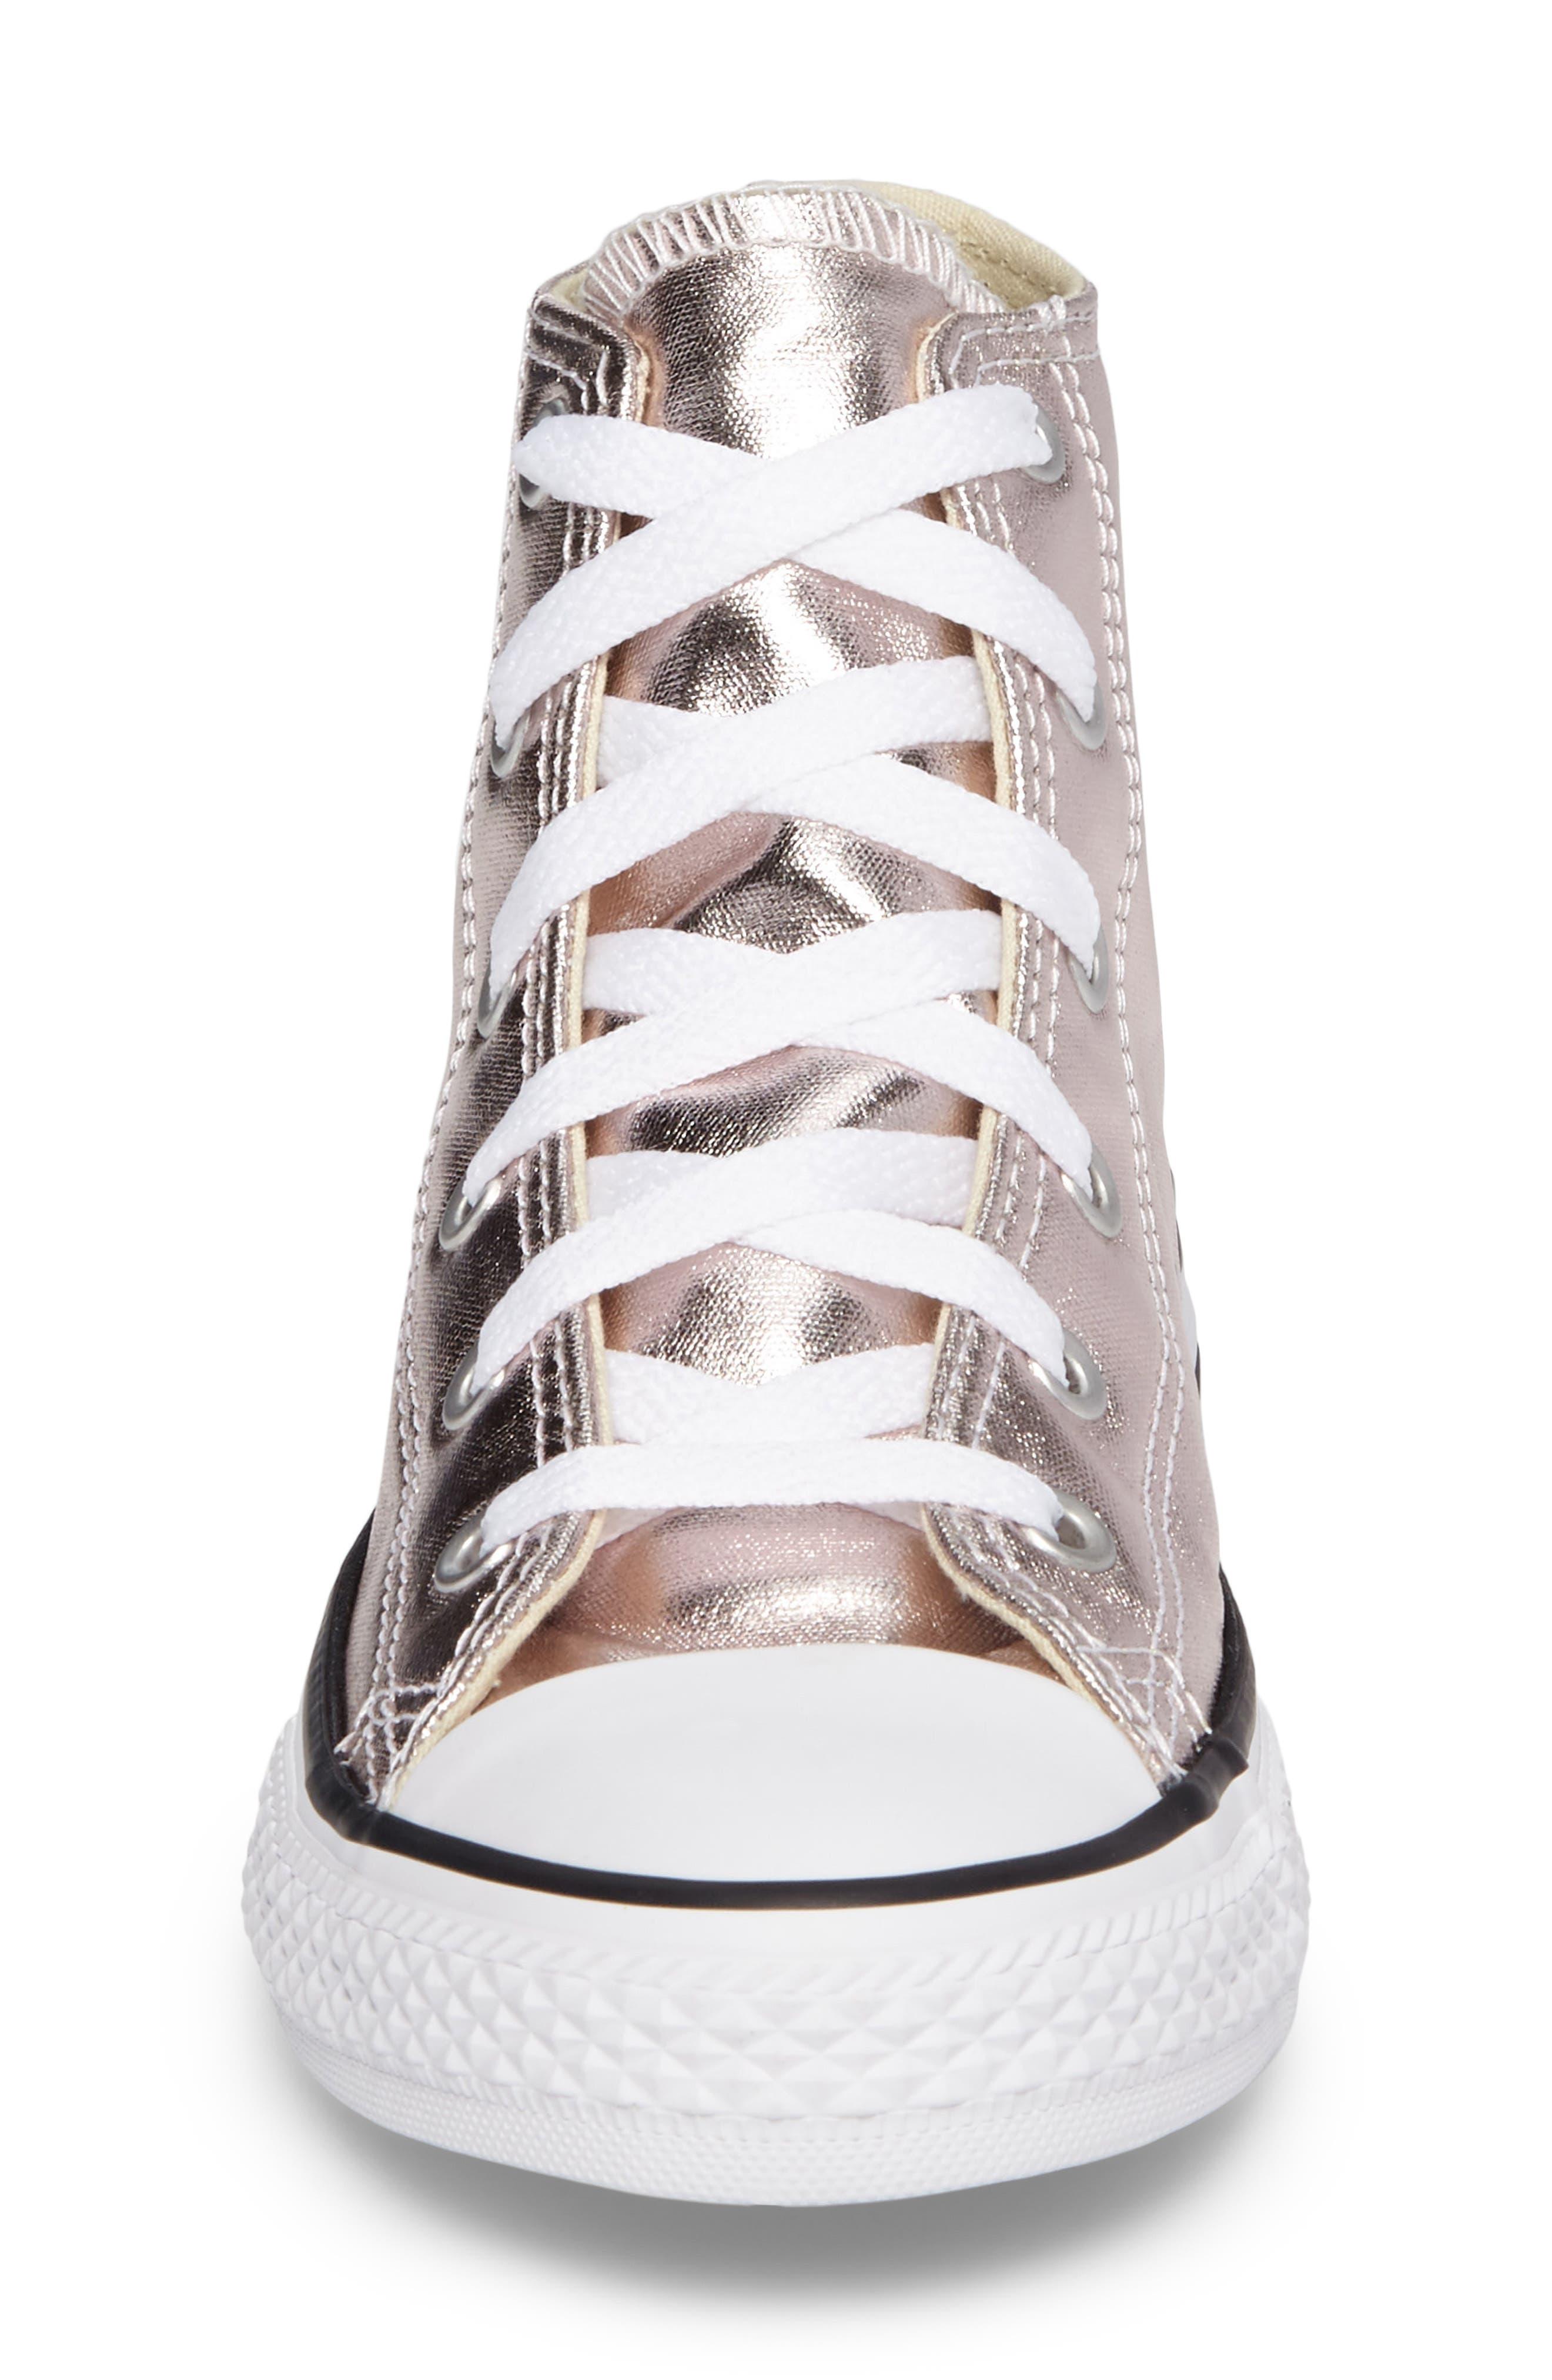 Chuck Taylor<sup>®</sup> All Star<sup>®</sup> Seasonal Metallic High Top Sneaker,                             Alternate thumbnail 4, color,                             Rose Quartz/ White Canvas